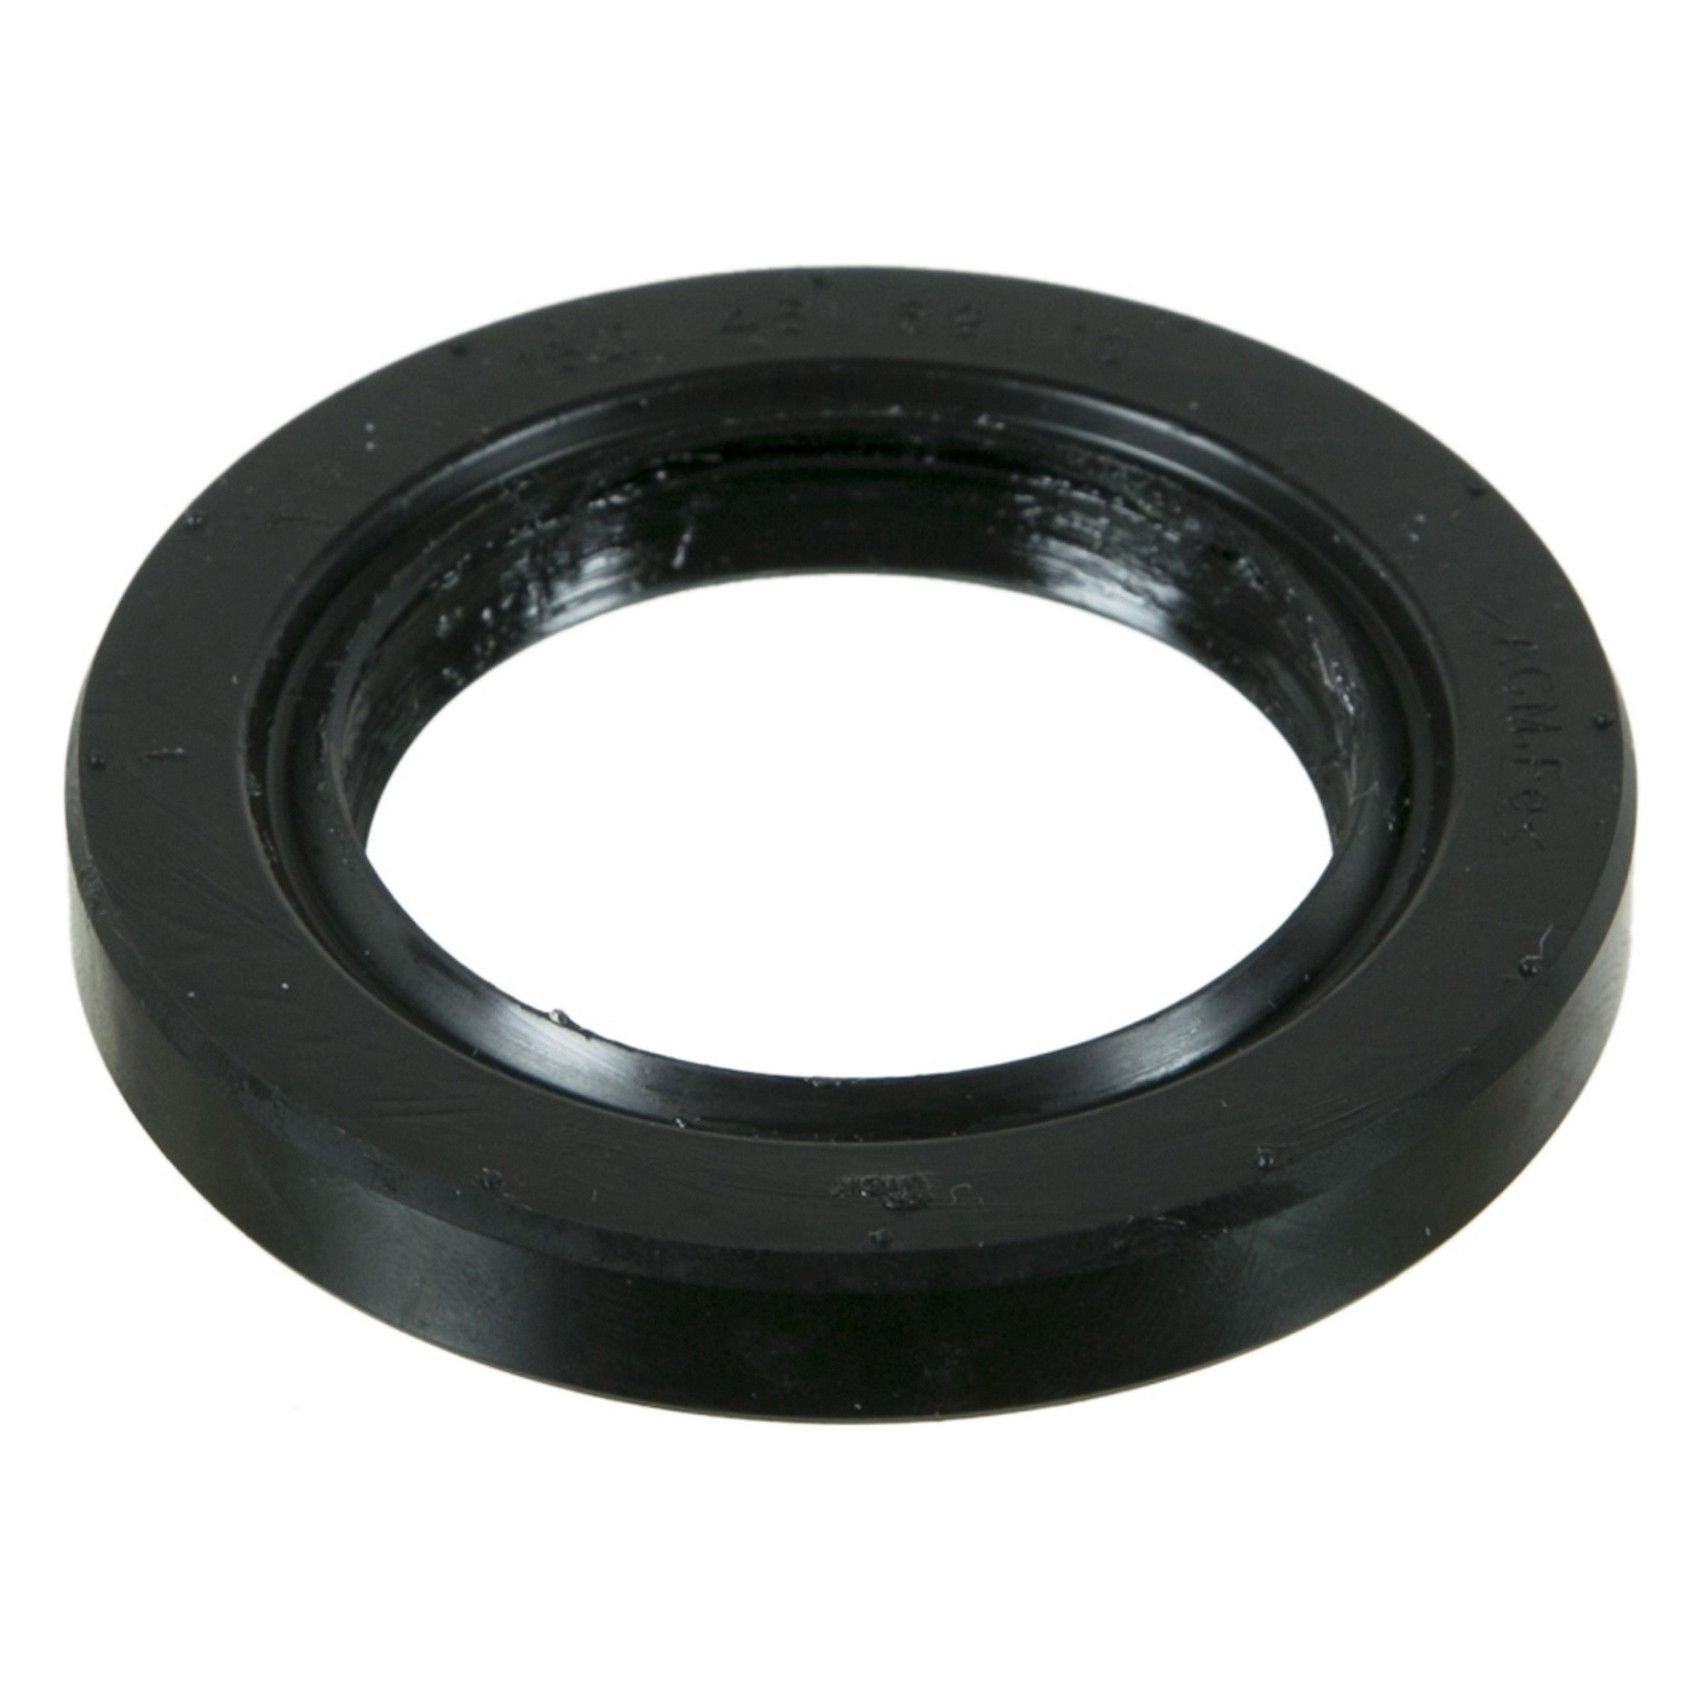 Infiniti Qx56 Transfer Case Output Shaft Seal Replacement Genuine 2004 Rear National Bearing 710917 Fuji Univance Atx14b 2 Speed Part Time